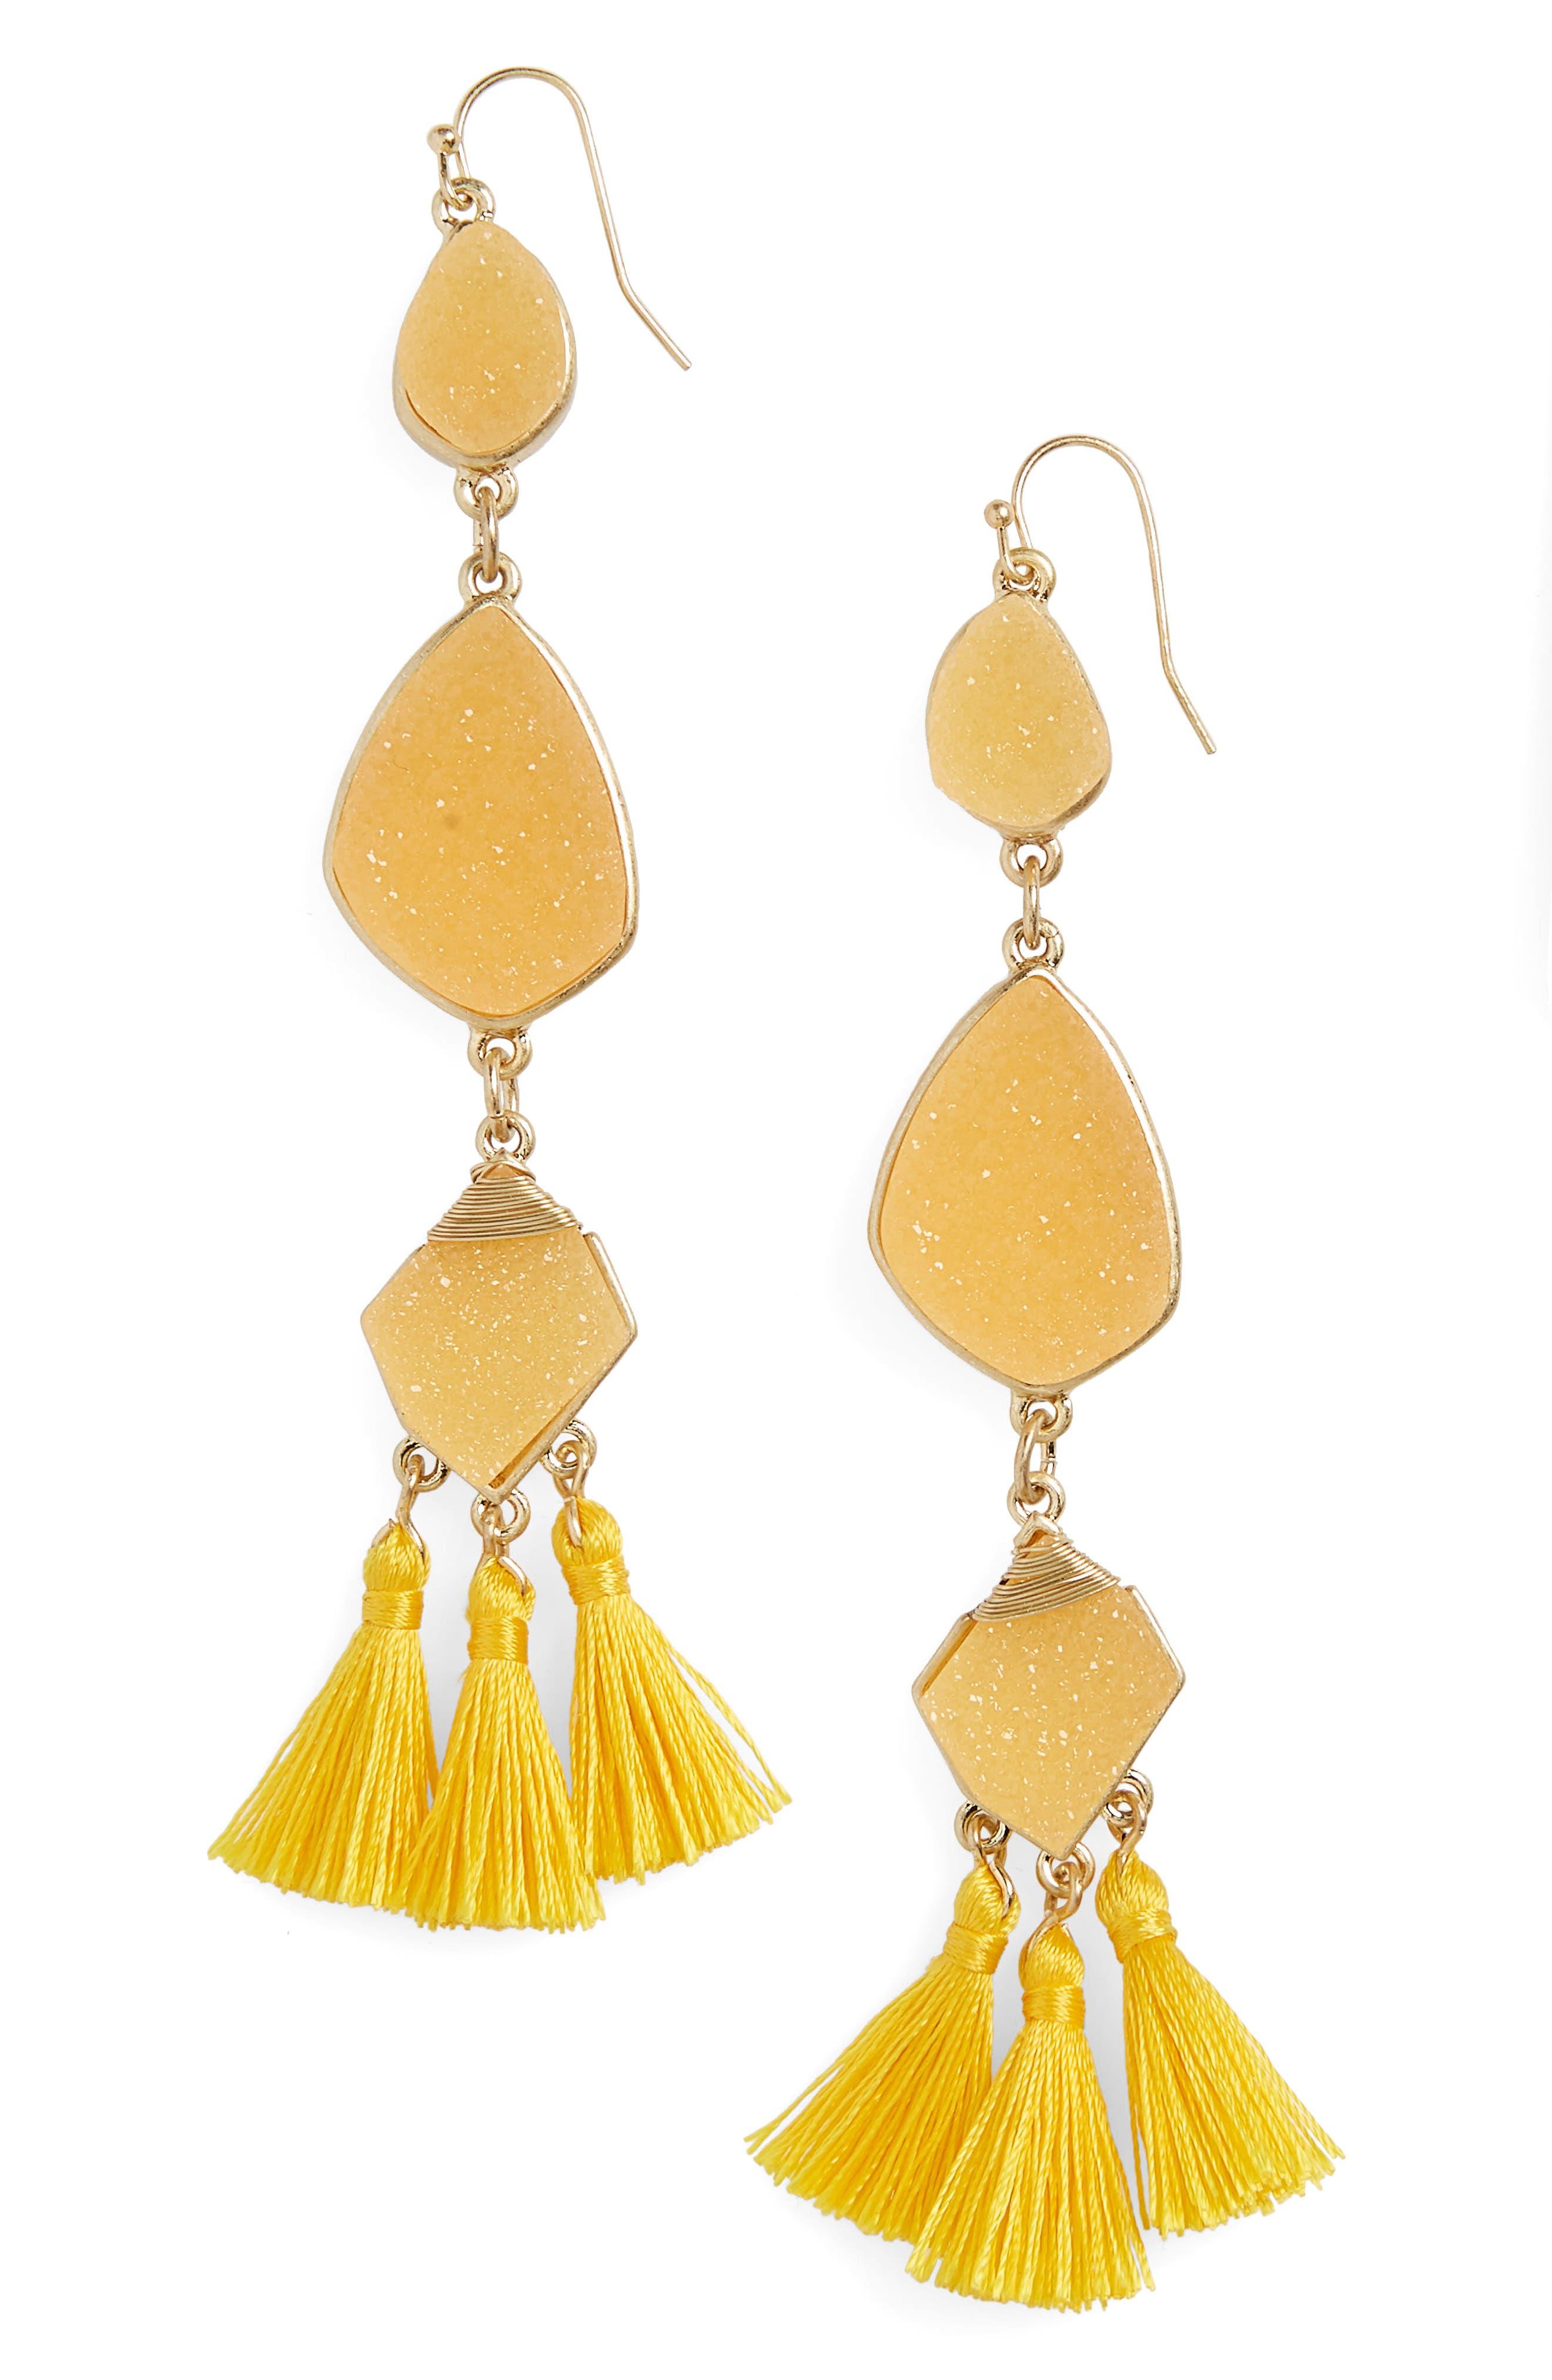 Drusy Tassel Earrings,                             Main thumbnail 1, color,                             Yellow